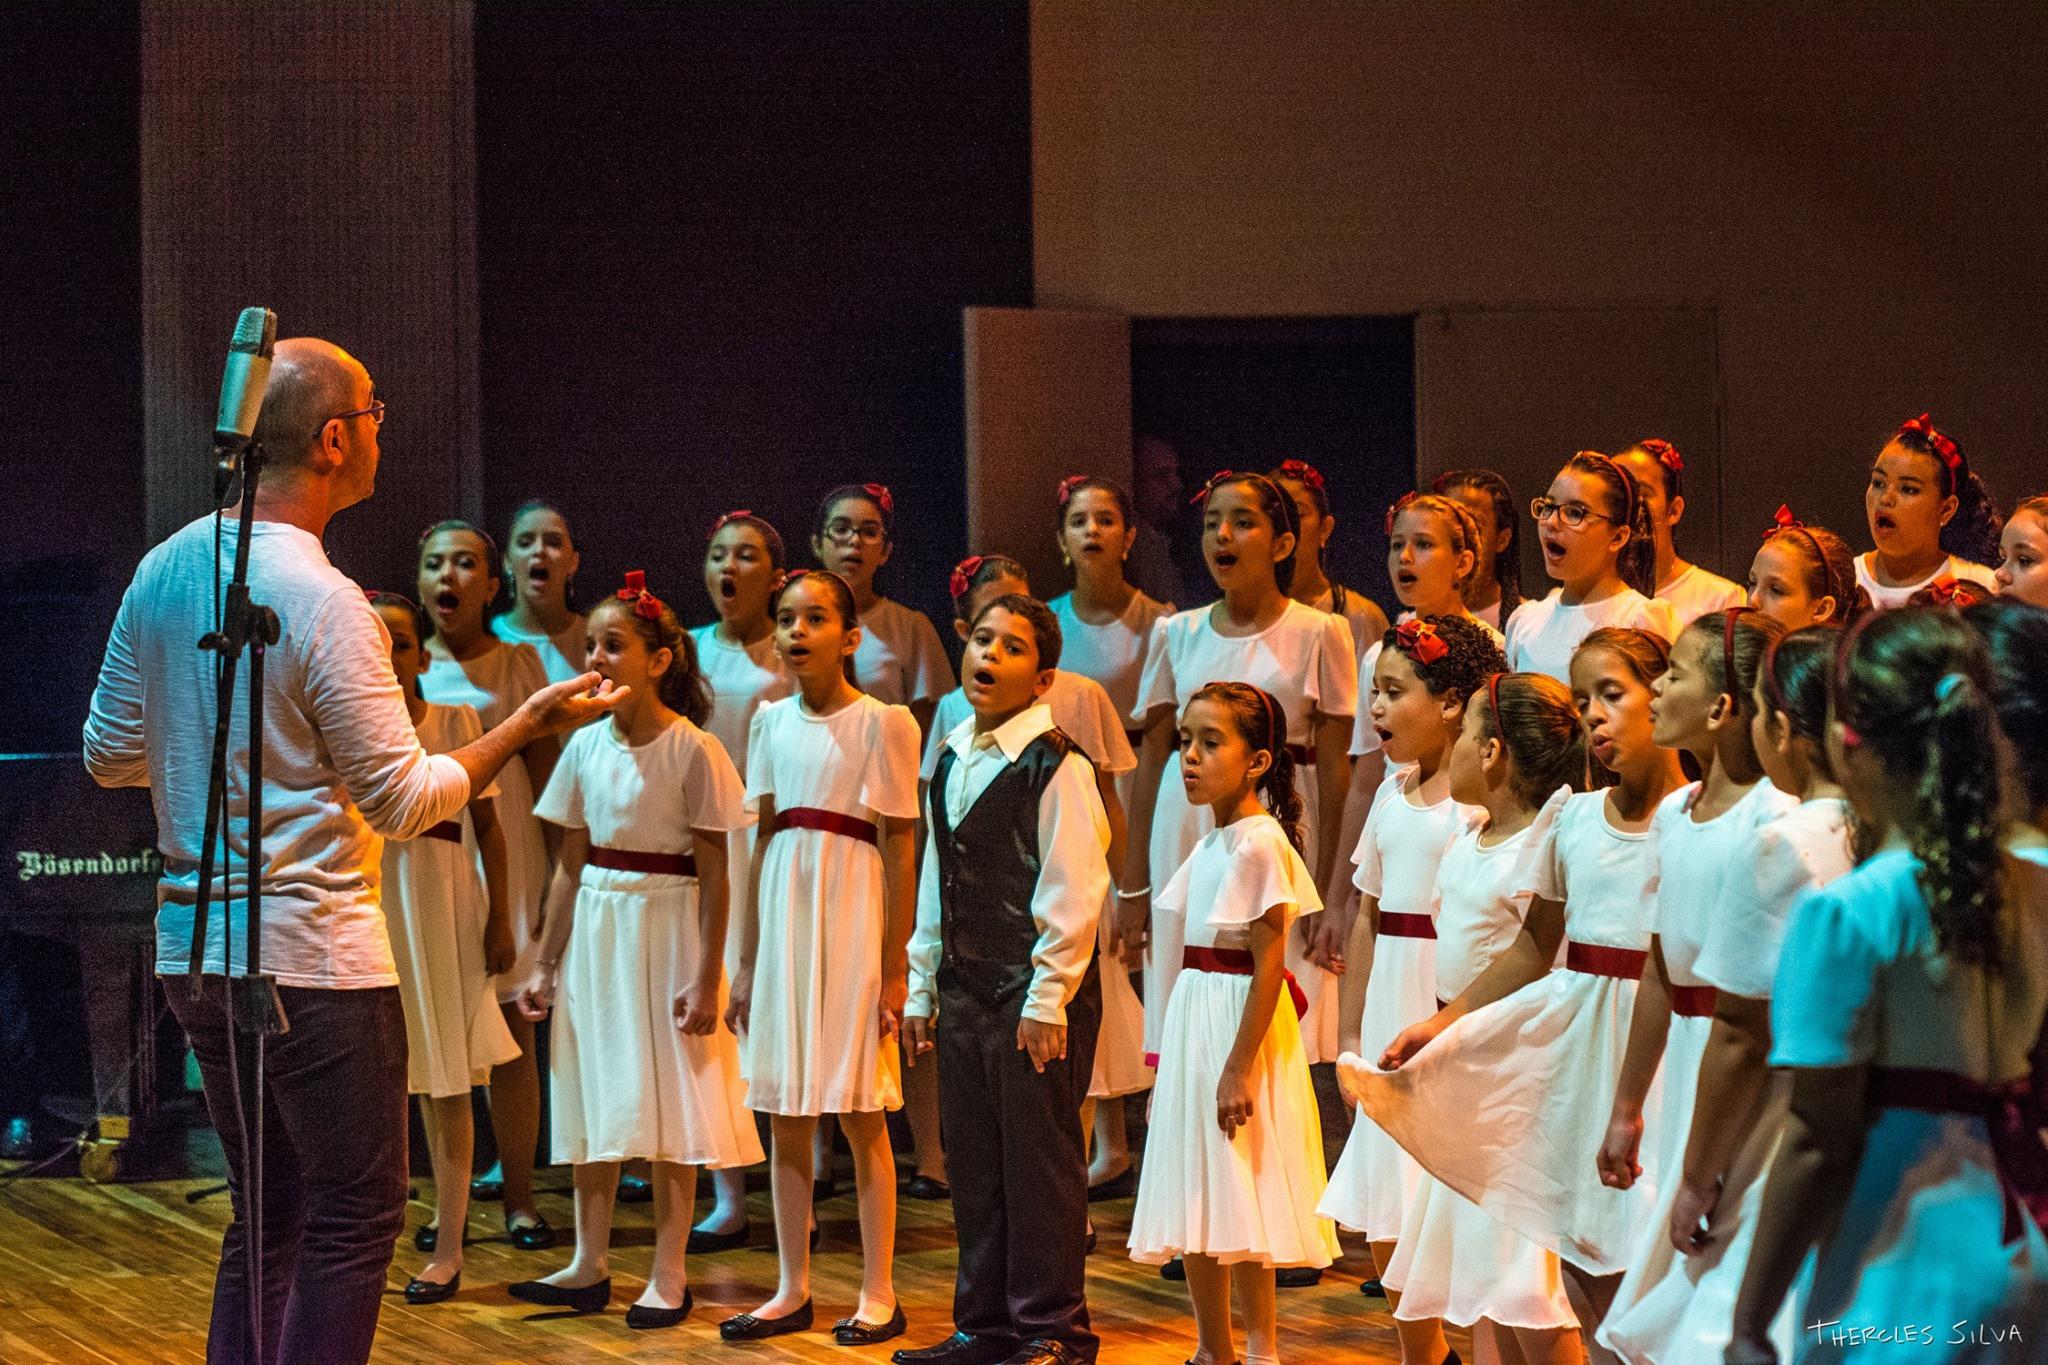 concerto coro infantil 12.10.16_thercles silva (4)